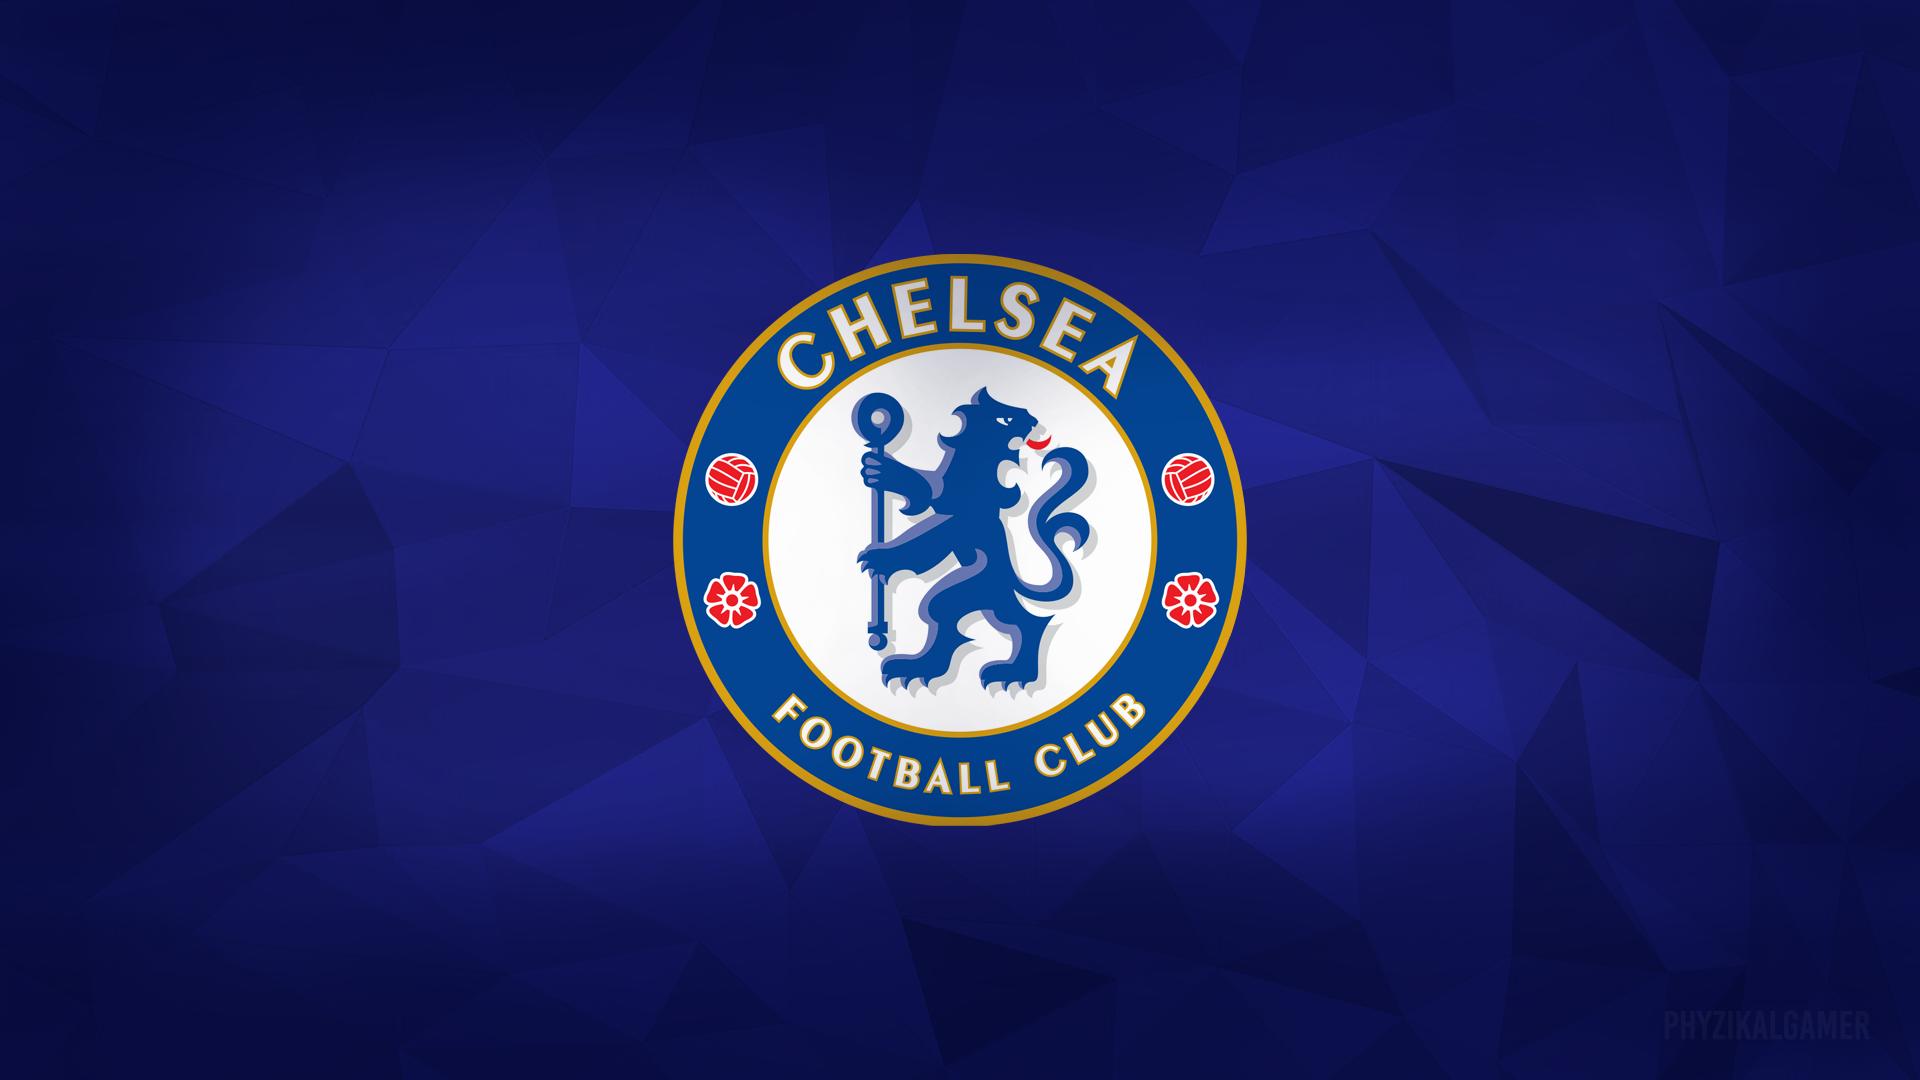 Chelsea Ajukan Banding Atas Keputusan FIFA